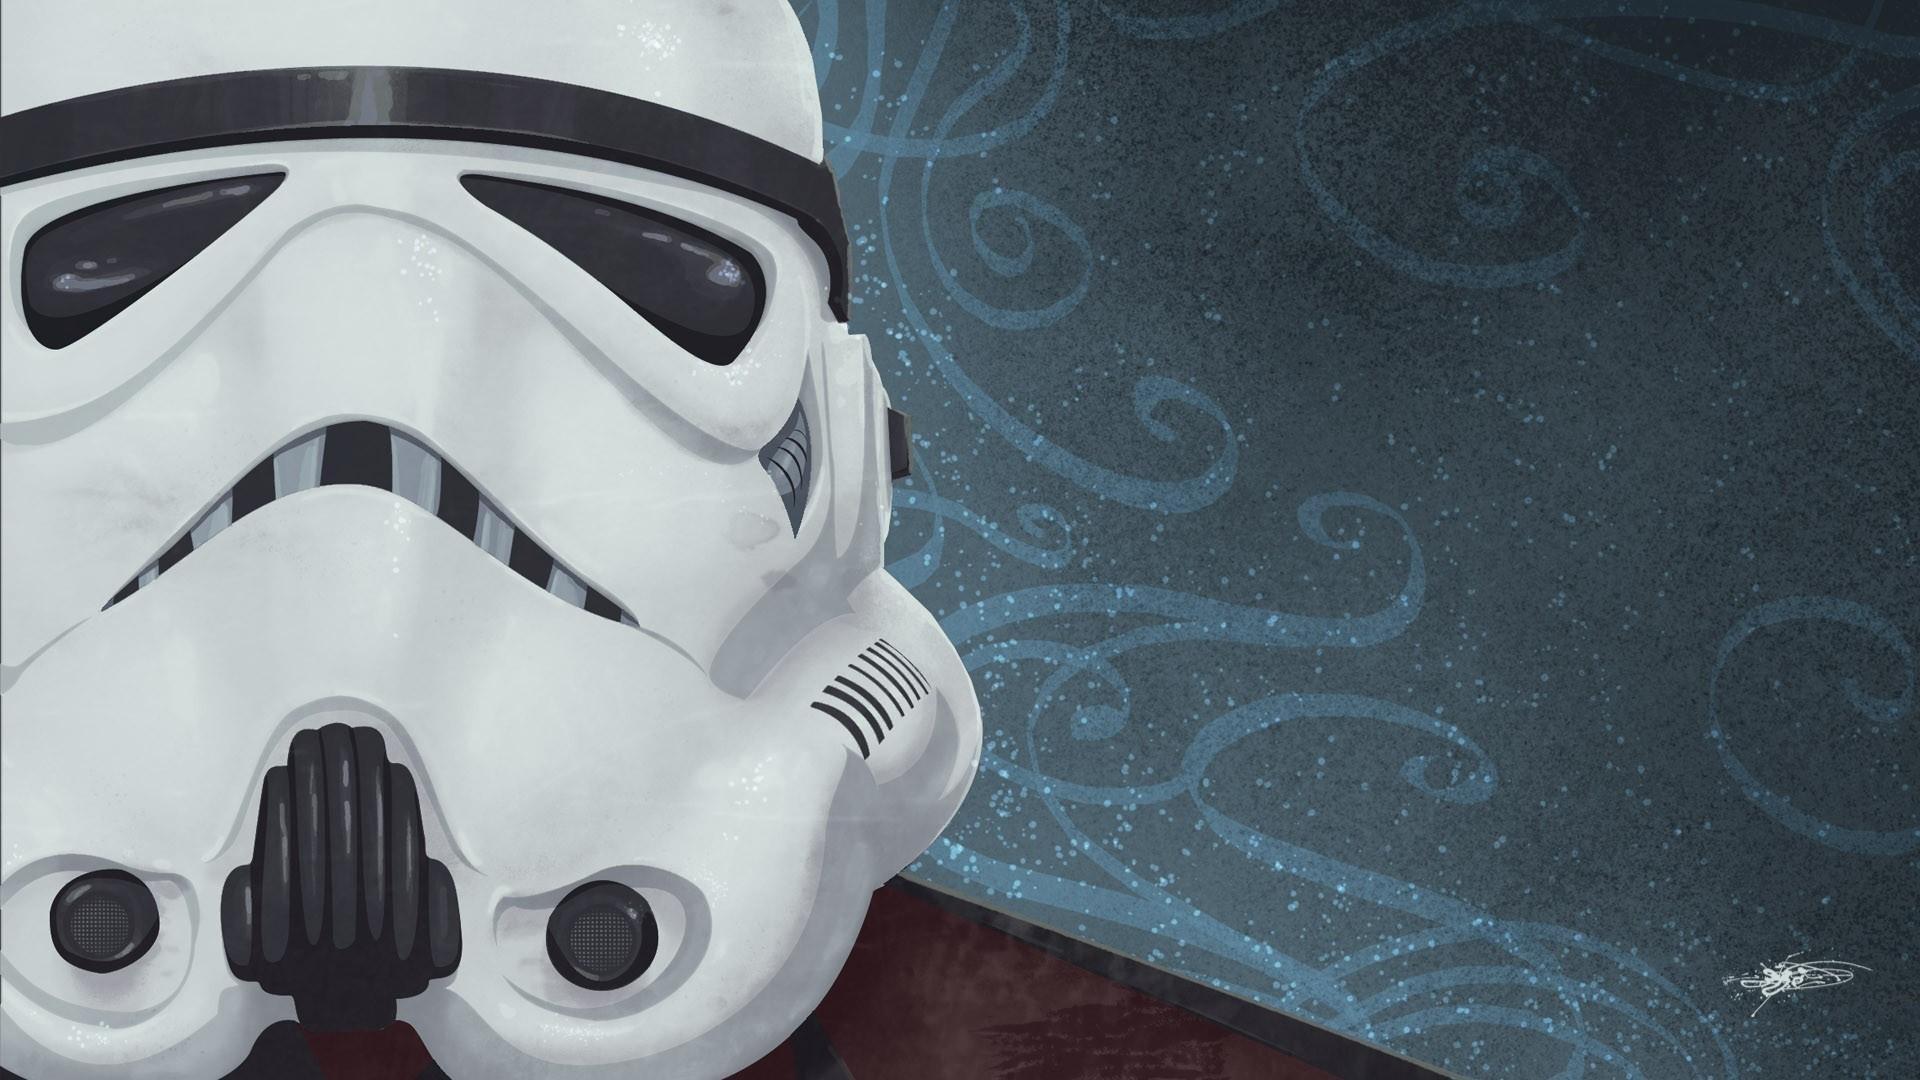 Stormtrooper wallpaper photo hd